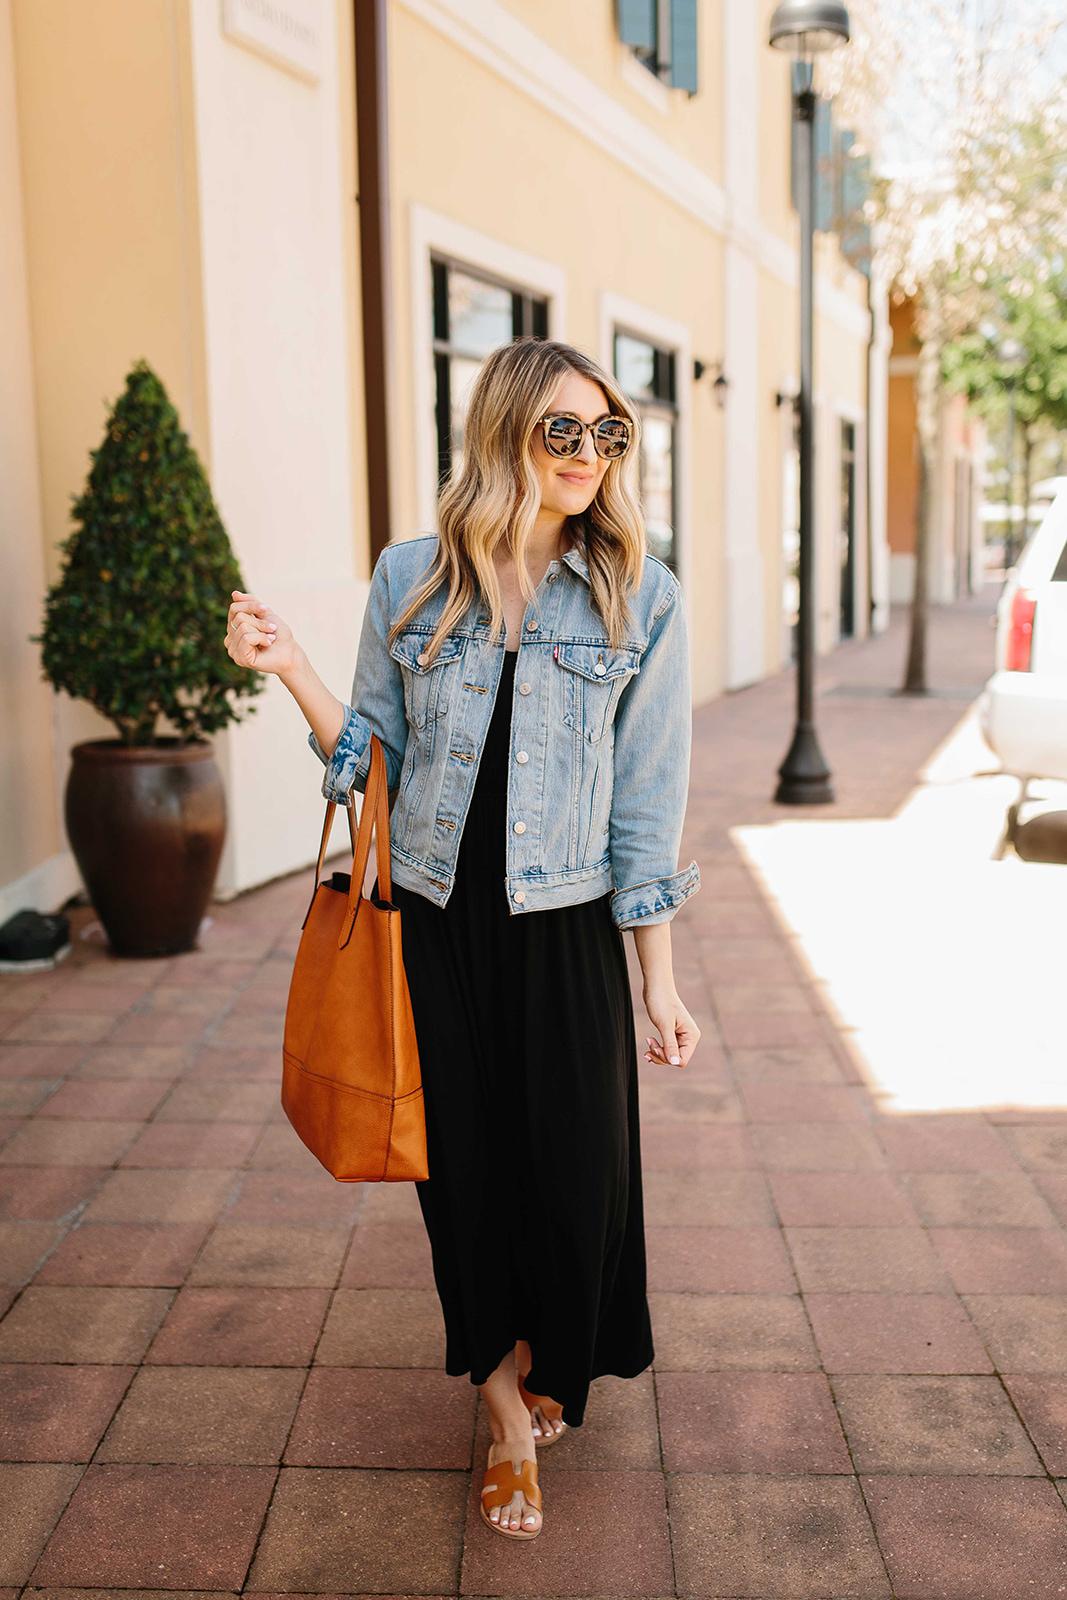 Black Maxi Dress with Denim Jacket… | Wear & When